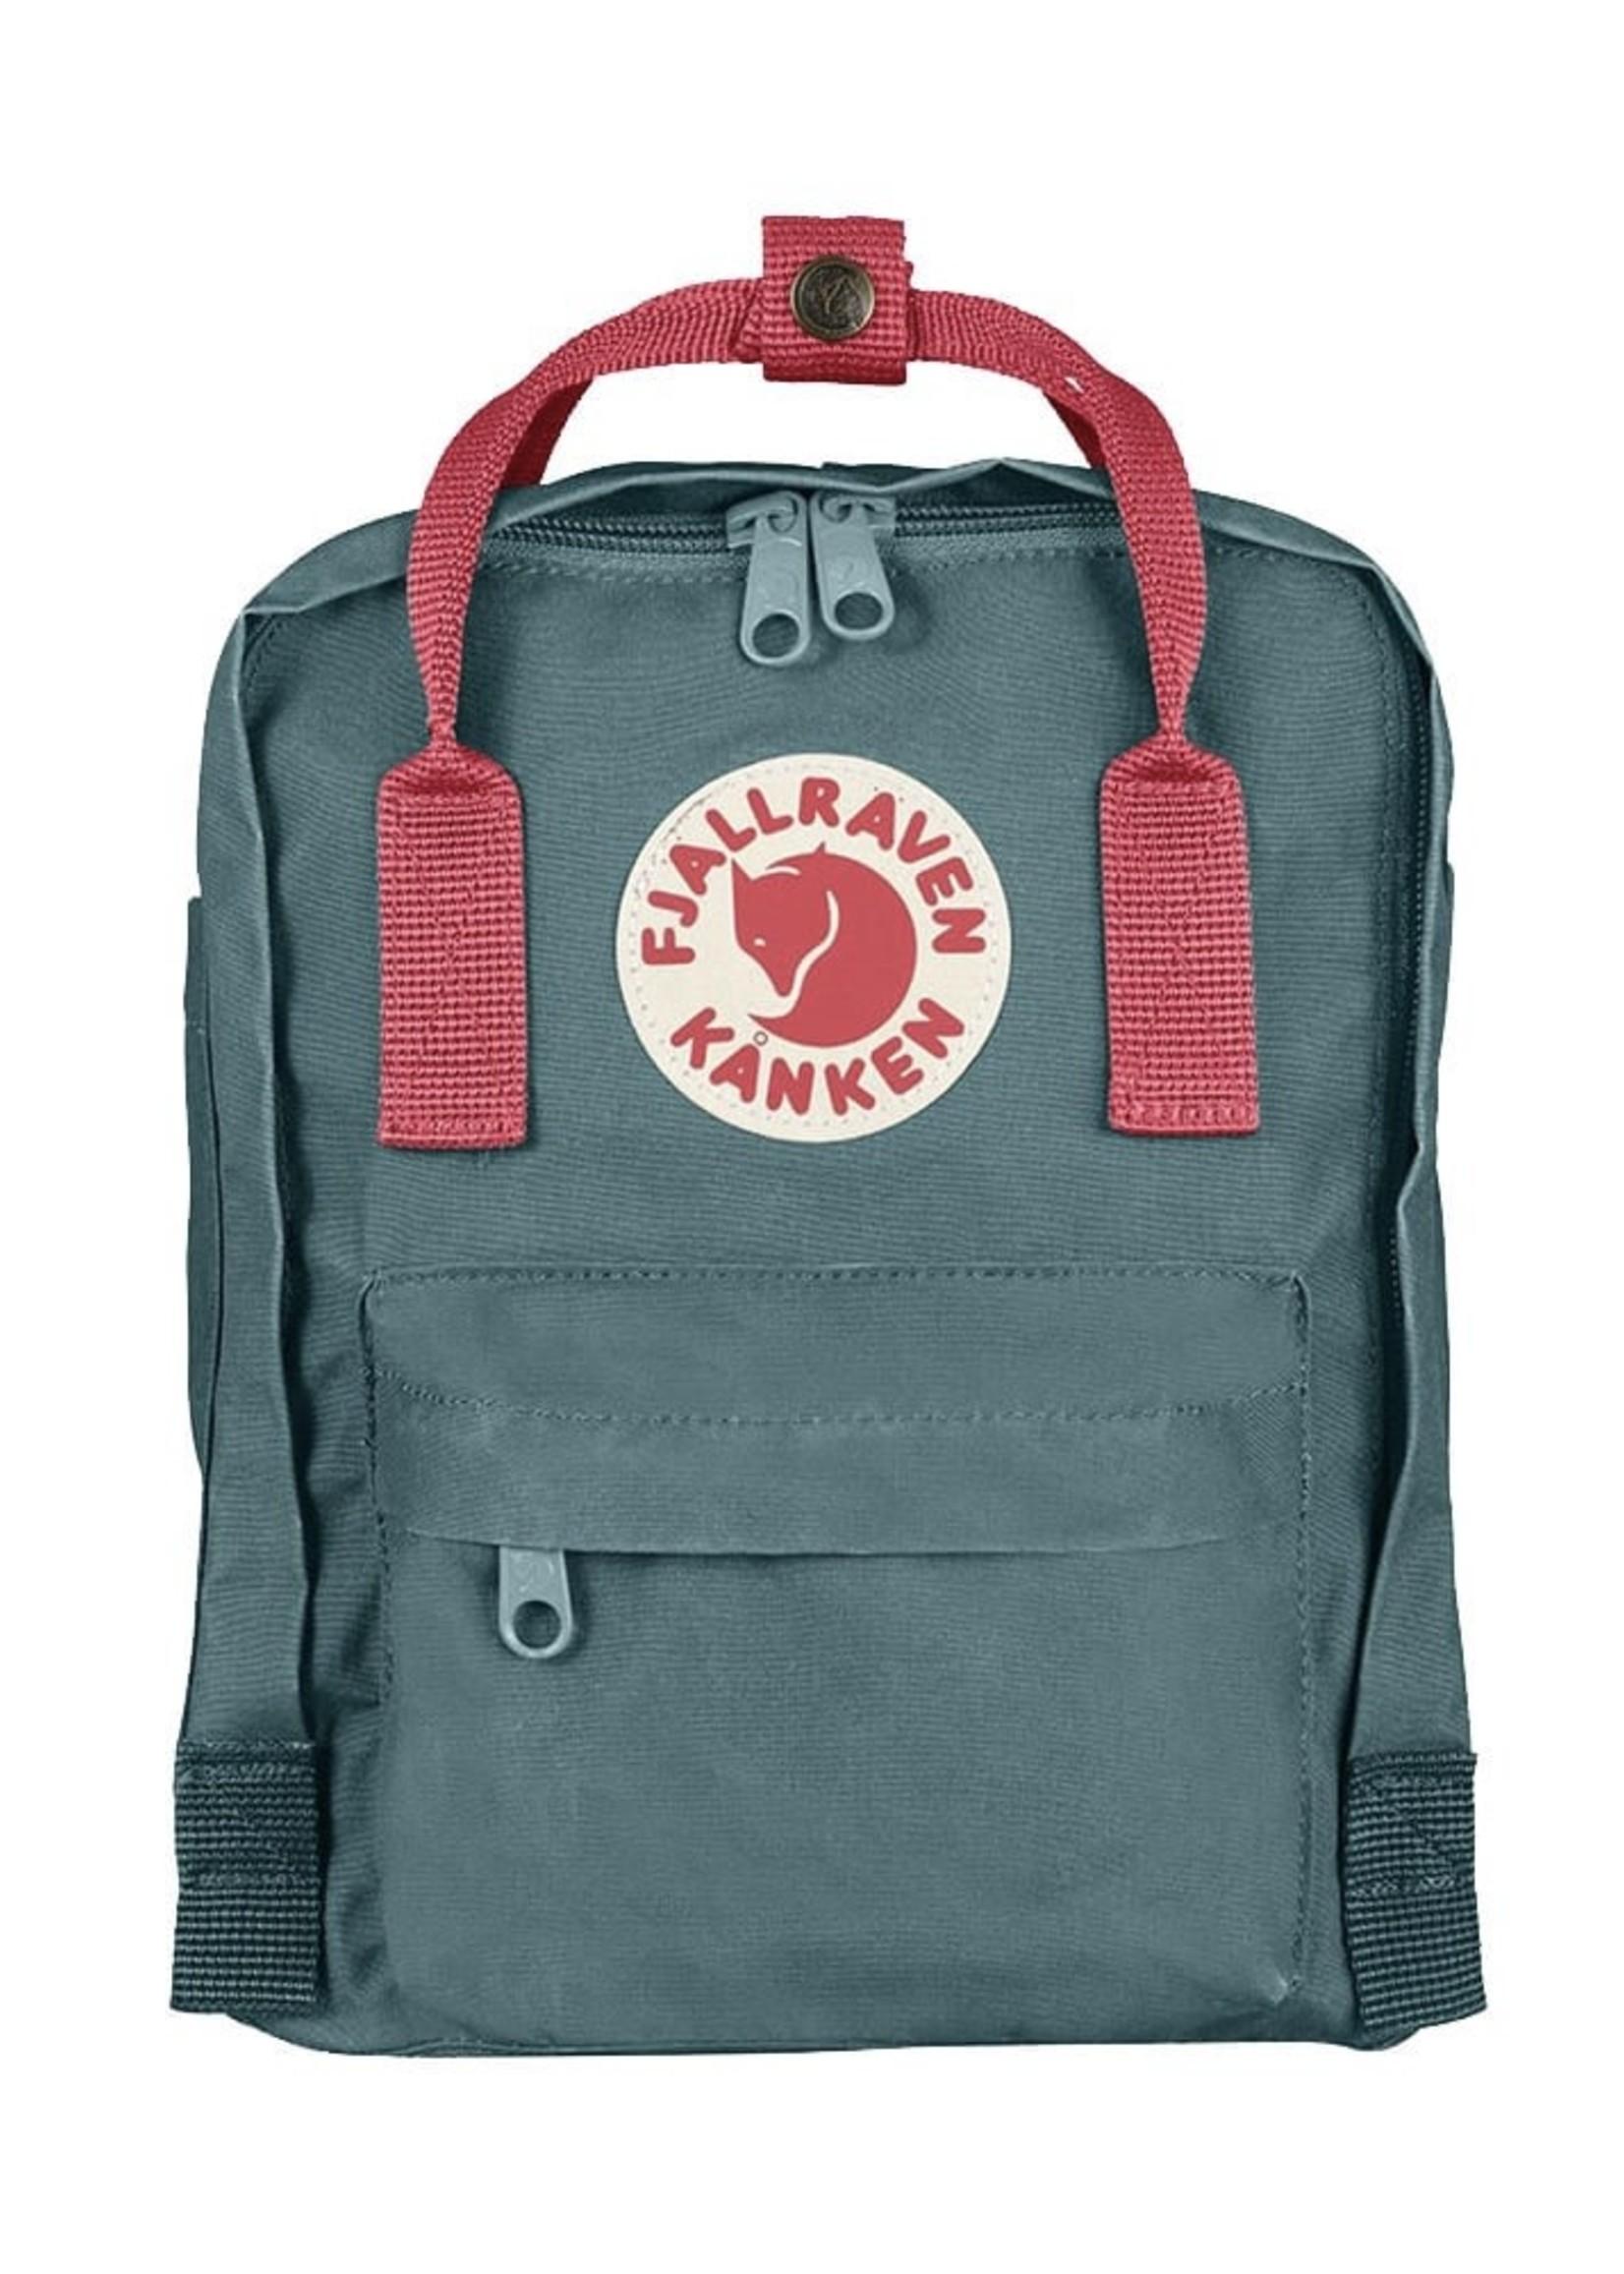 FJALL RAVEN Kanken Backpack Mini FROST GREEN/PEACH PINK